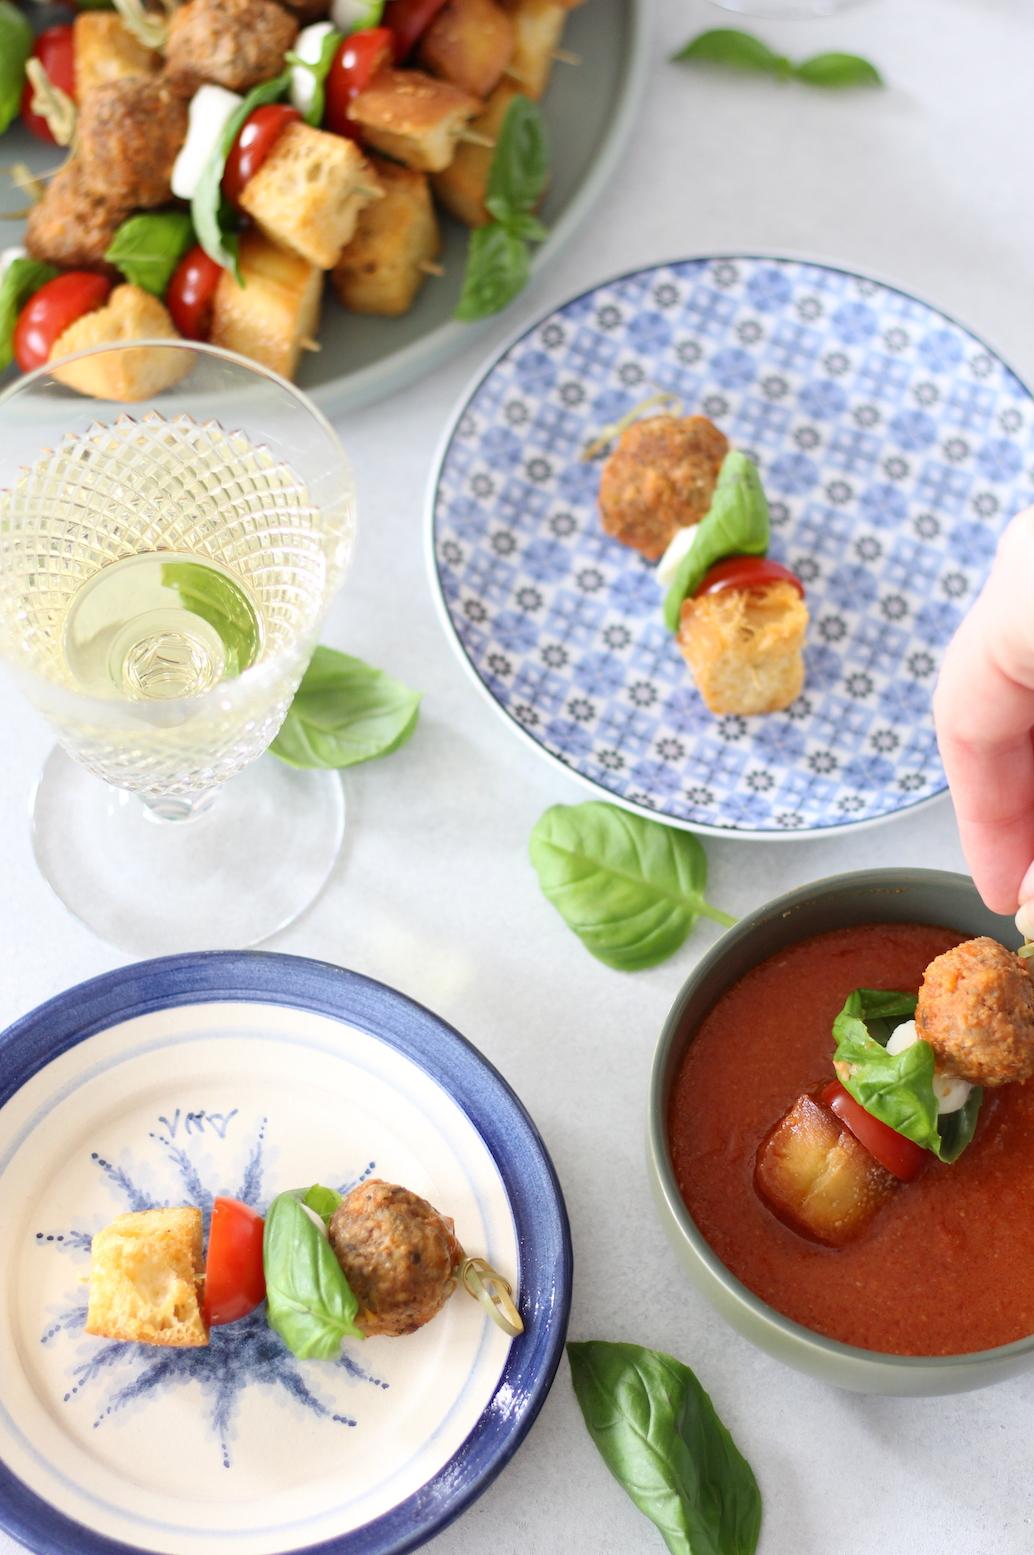 Kookdag Francesca Kookt | www.deedylicious.nl